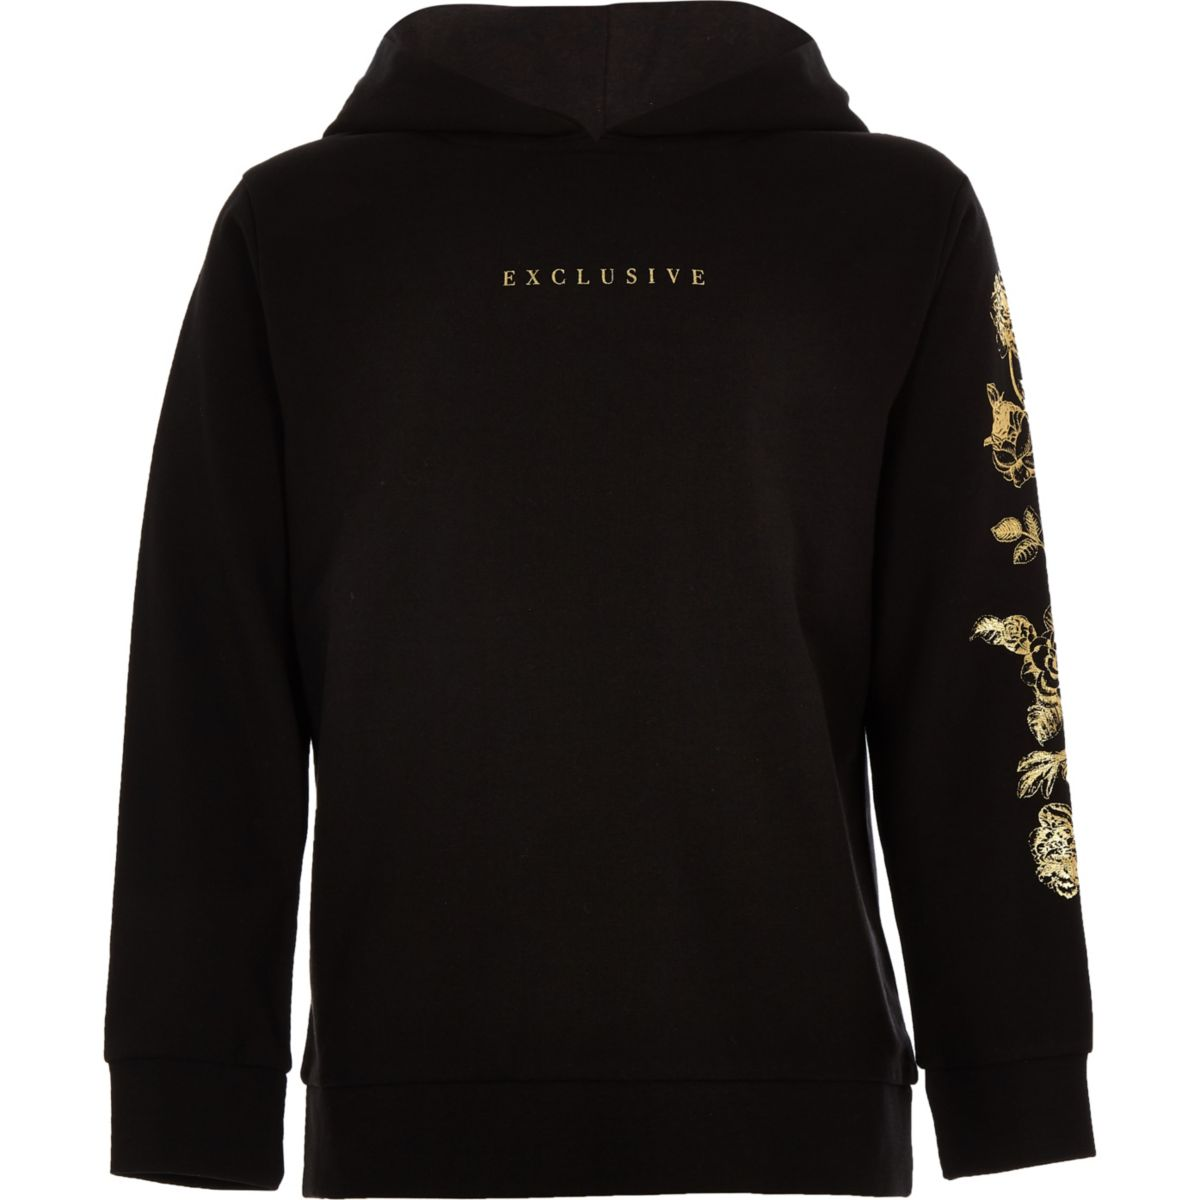 Boys black 'exclusive' gold foil print hoodie